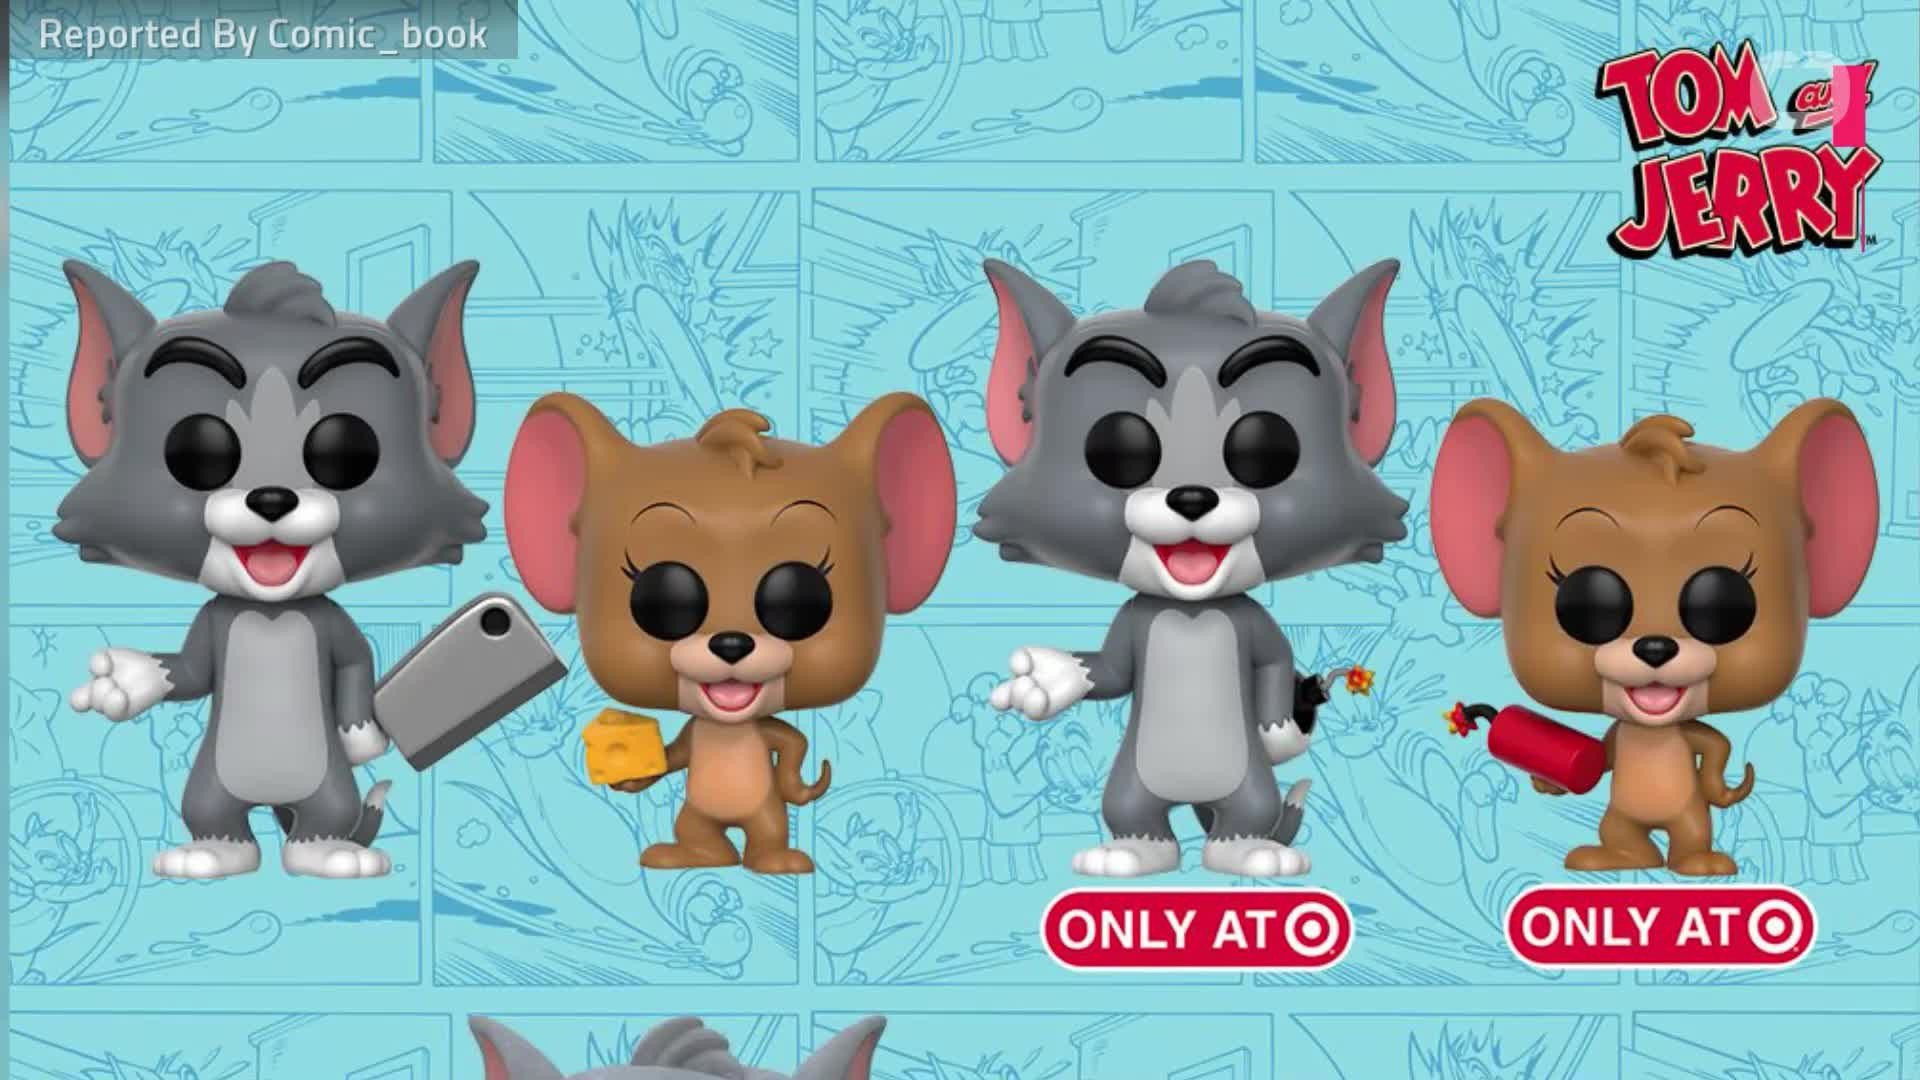 Tom et Jerry S1-Tom Brand New in Box Funko-POP Animation